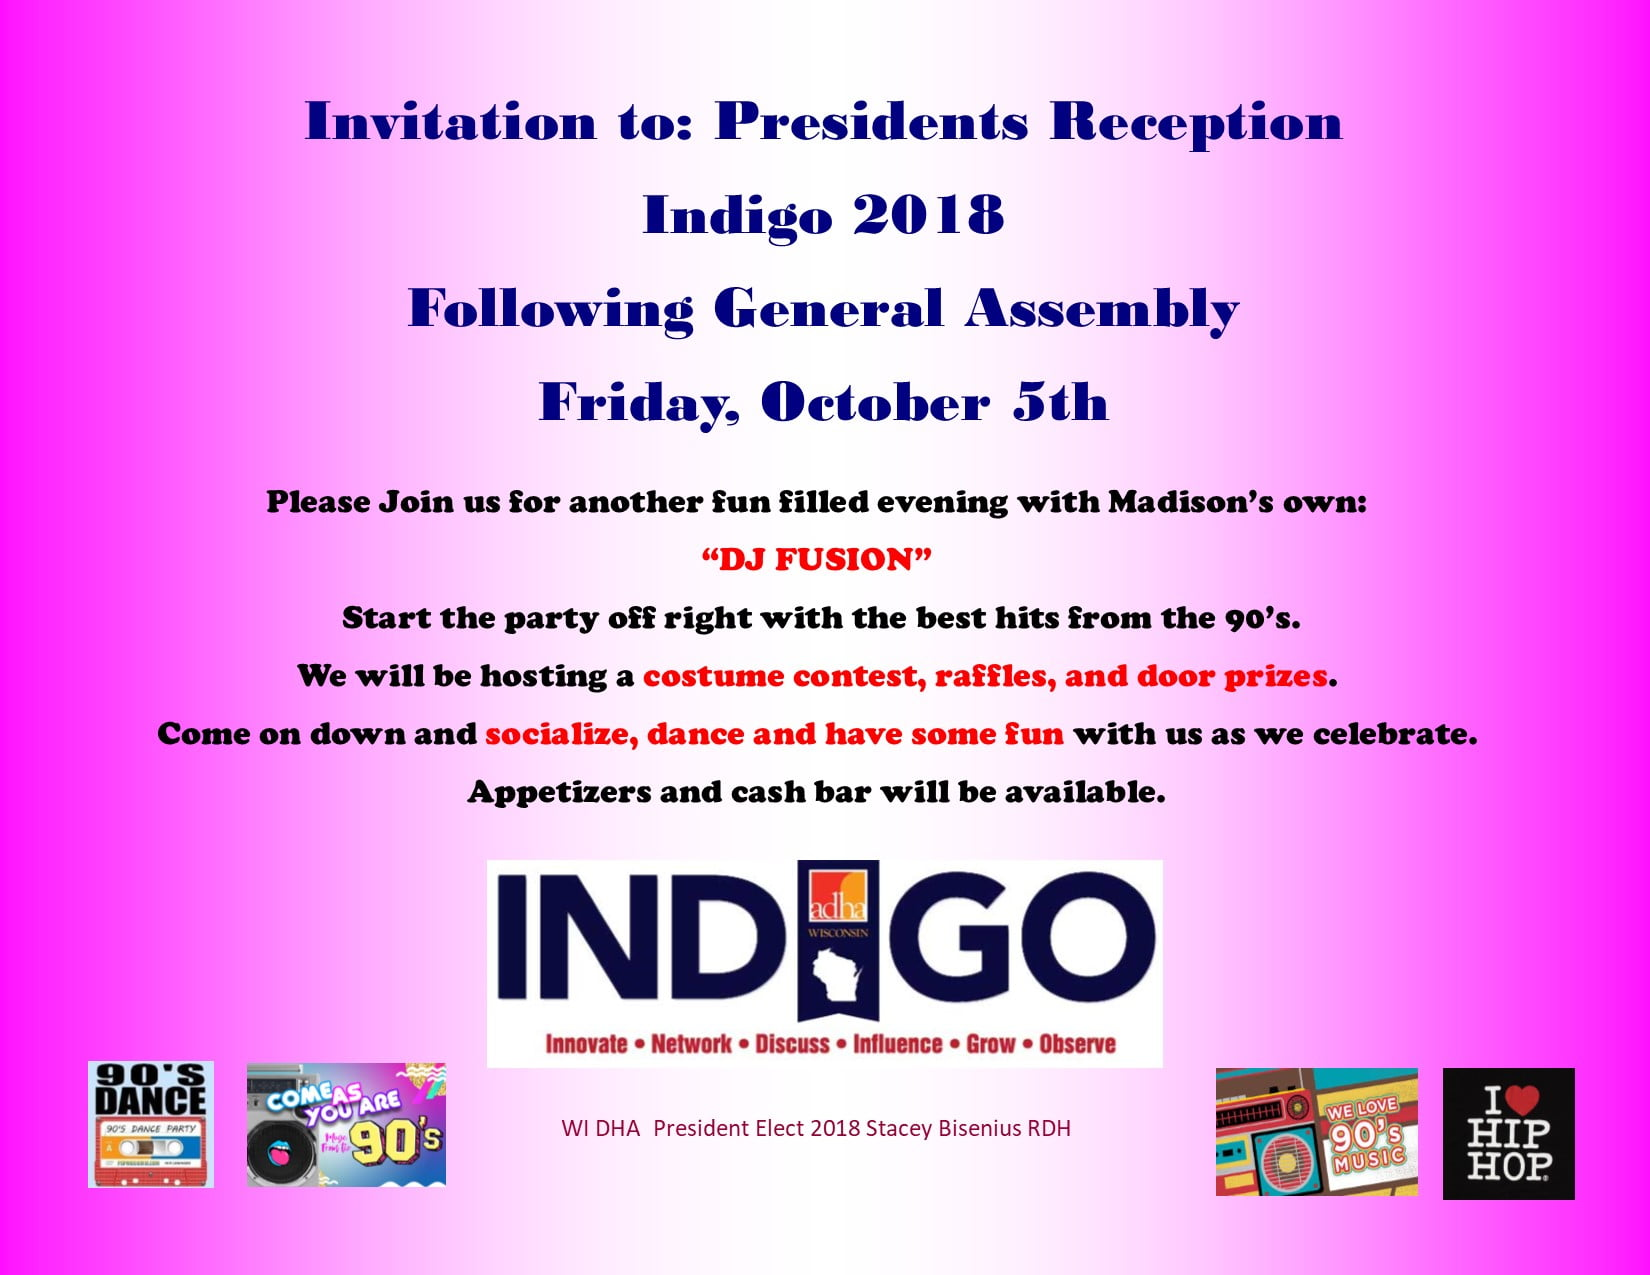 Indigo President's Reception 1